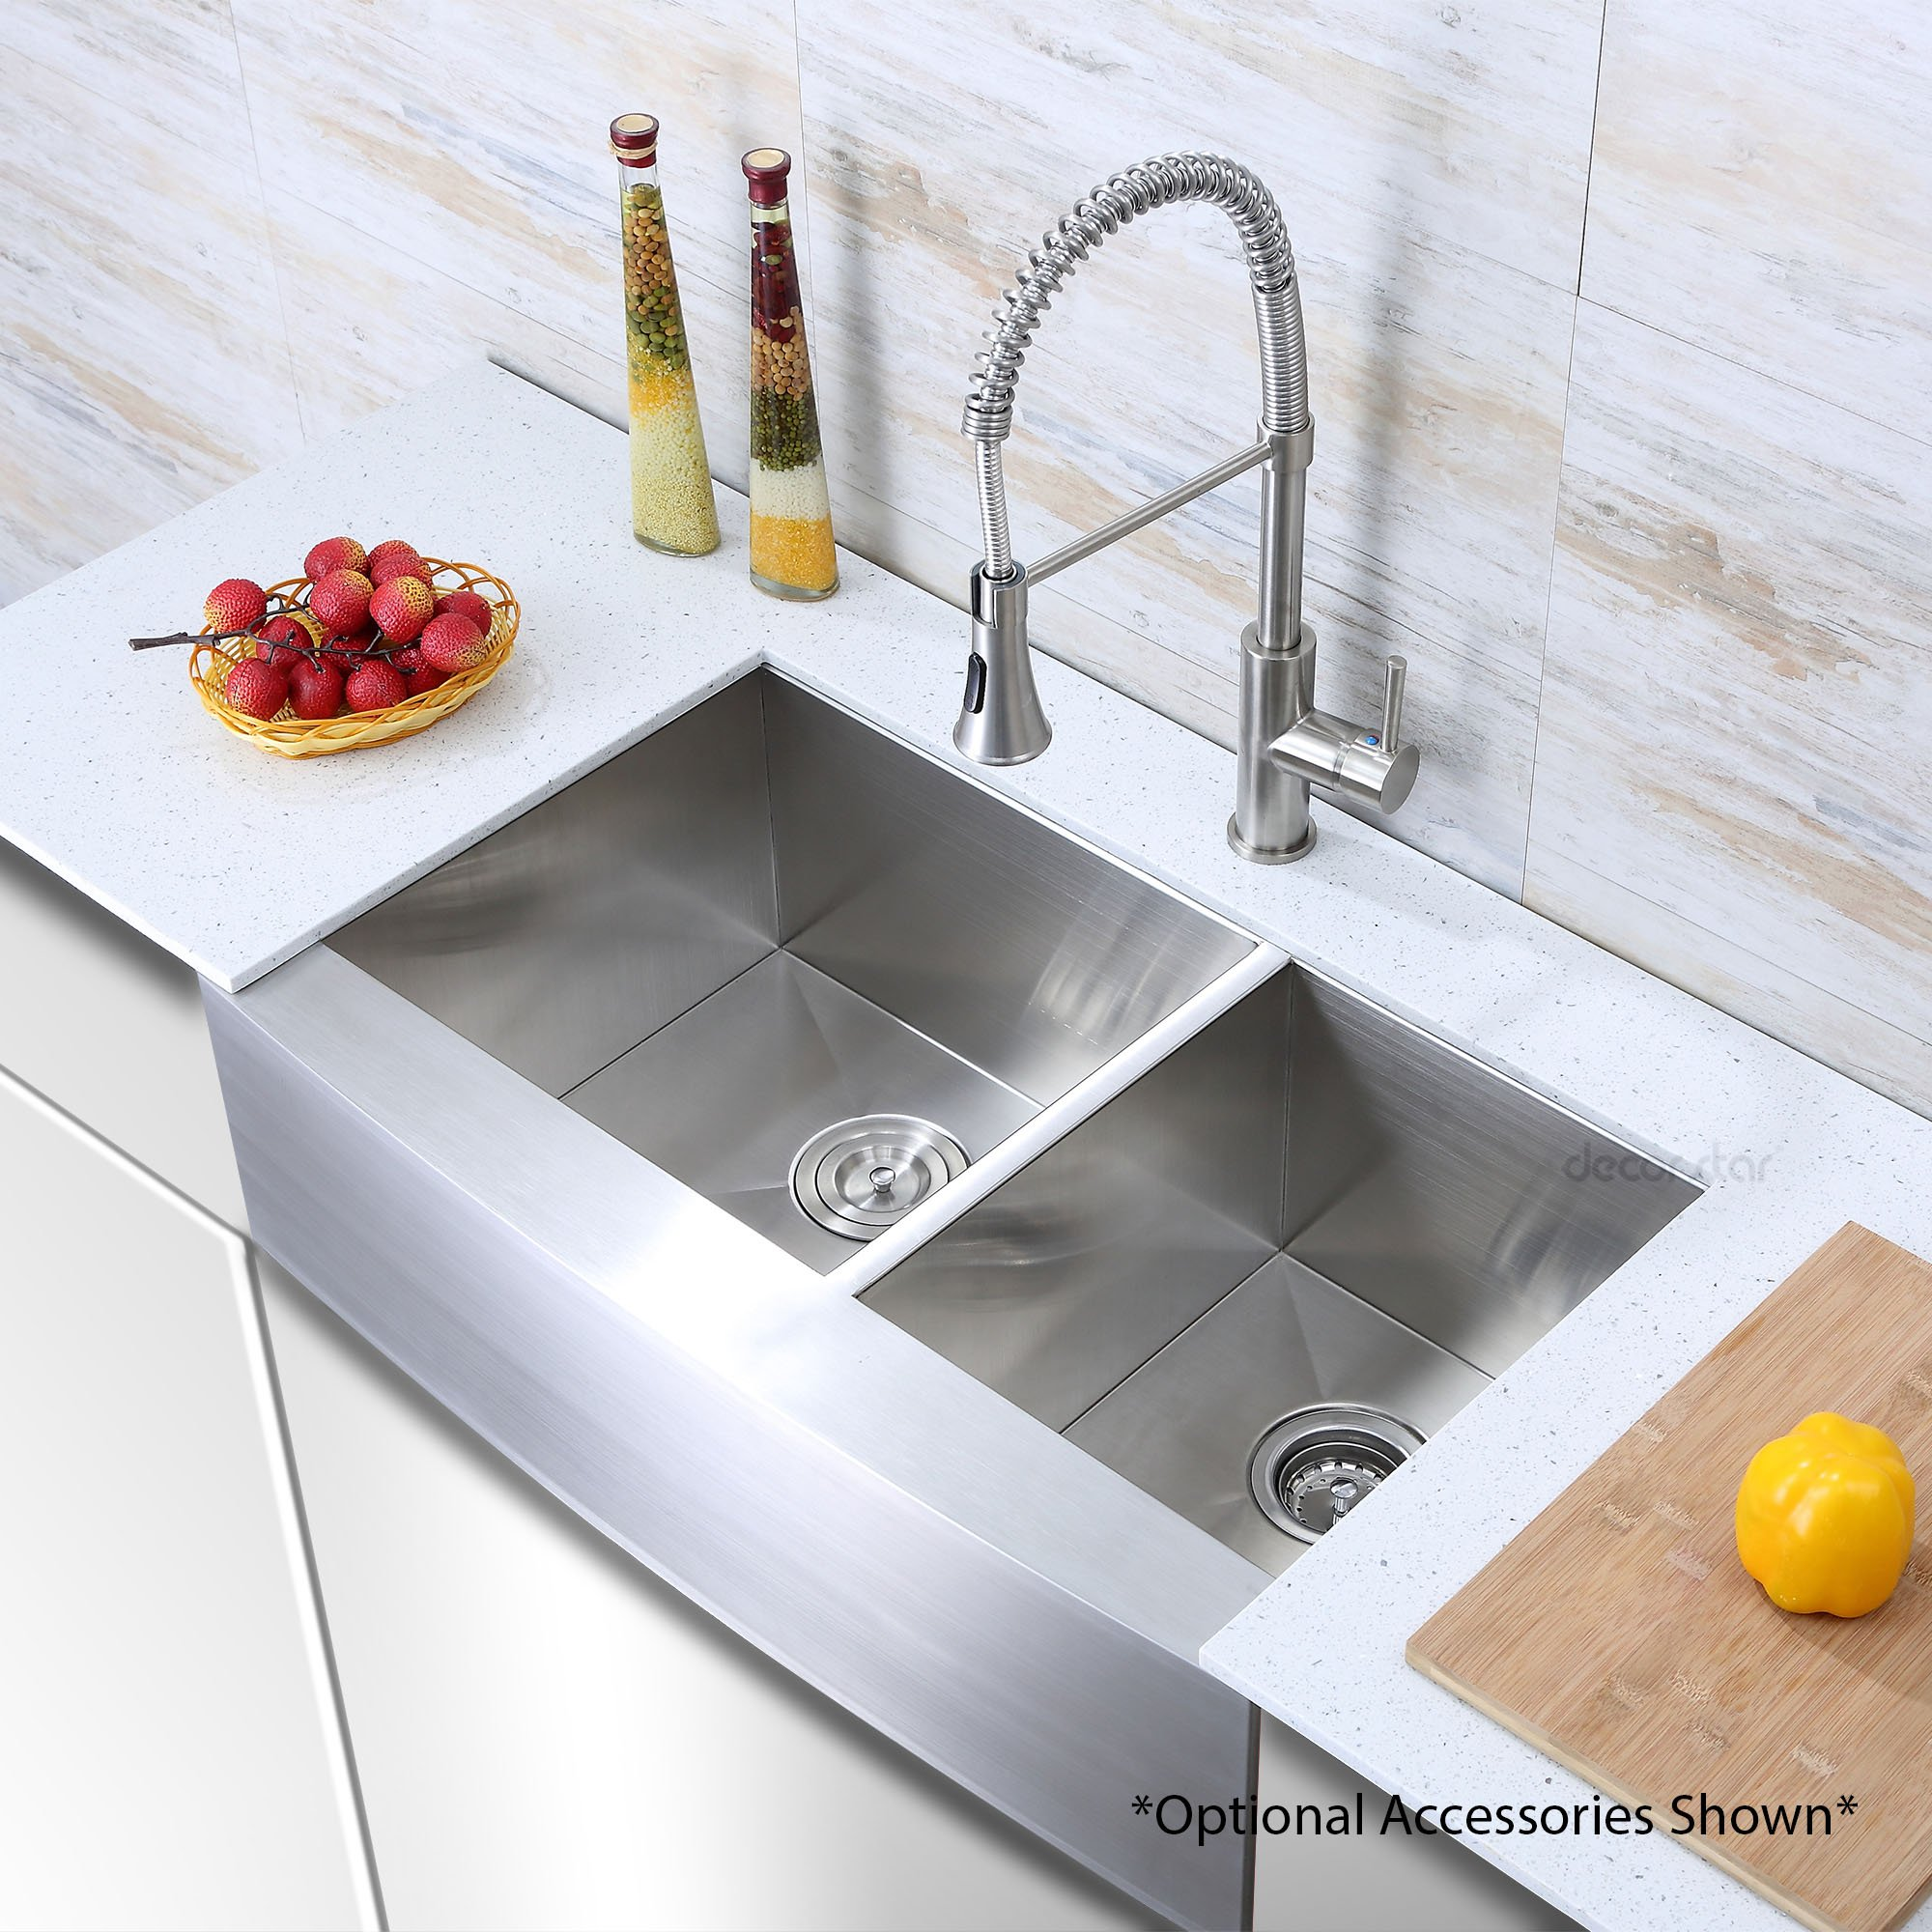 Decor Star F-002-Z 33 Inch x 20 Inch Farmhouse Apron 60/40 Offset Double Bowl 16 Gauge Stainless Steel Luxury Handmade Kitchen Sink cUPC Zero Radius by Décor Star (Image #1)